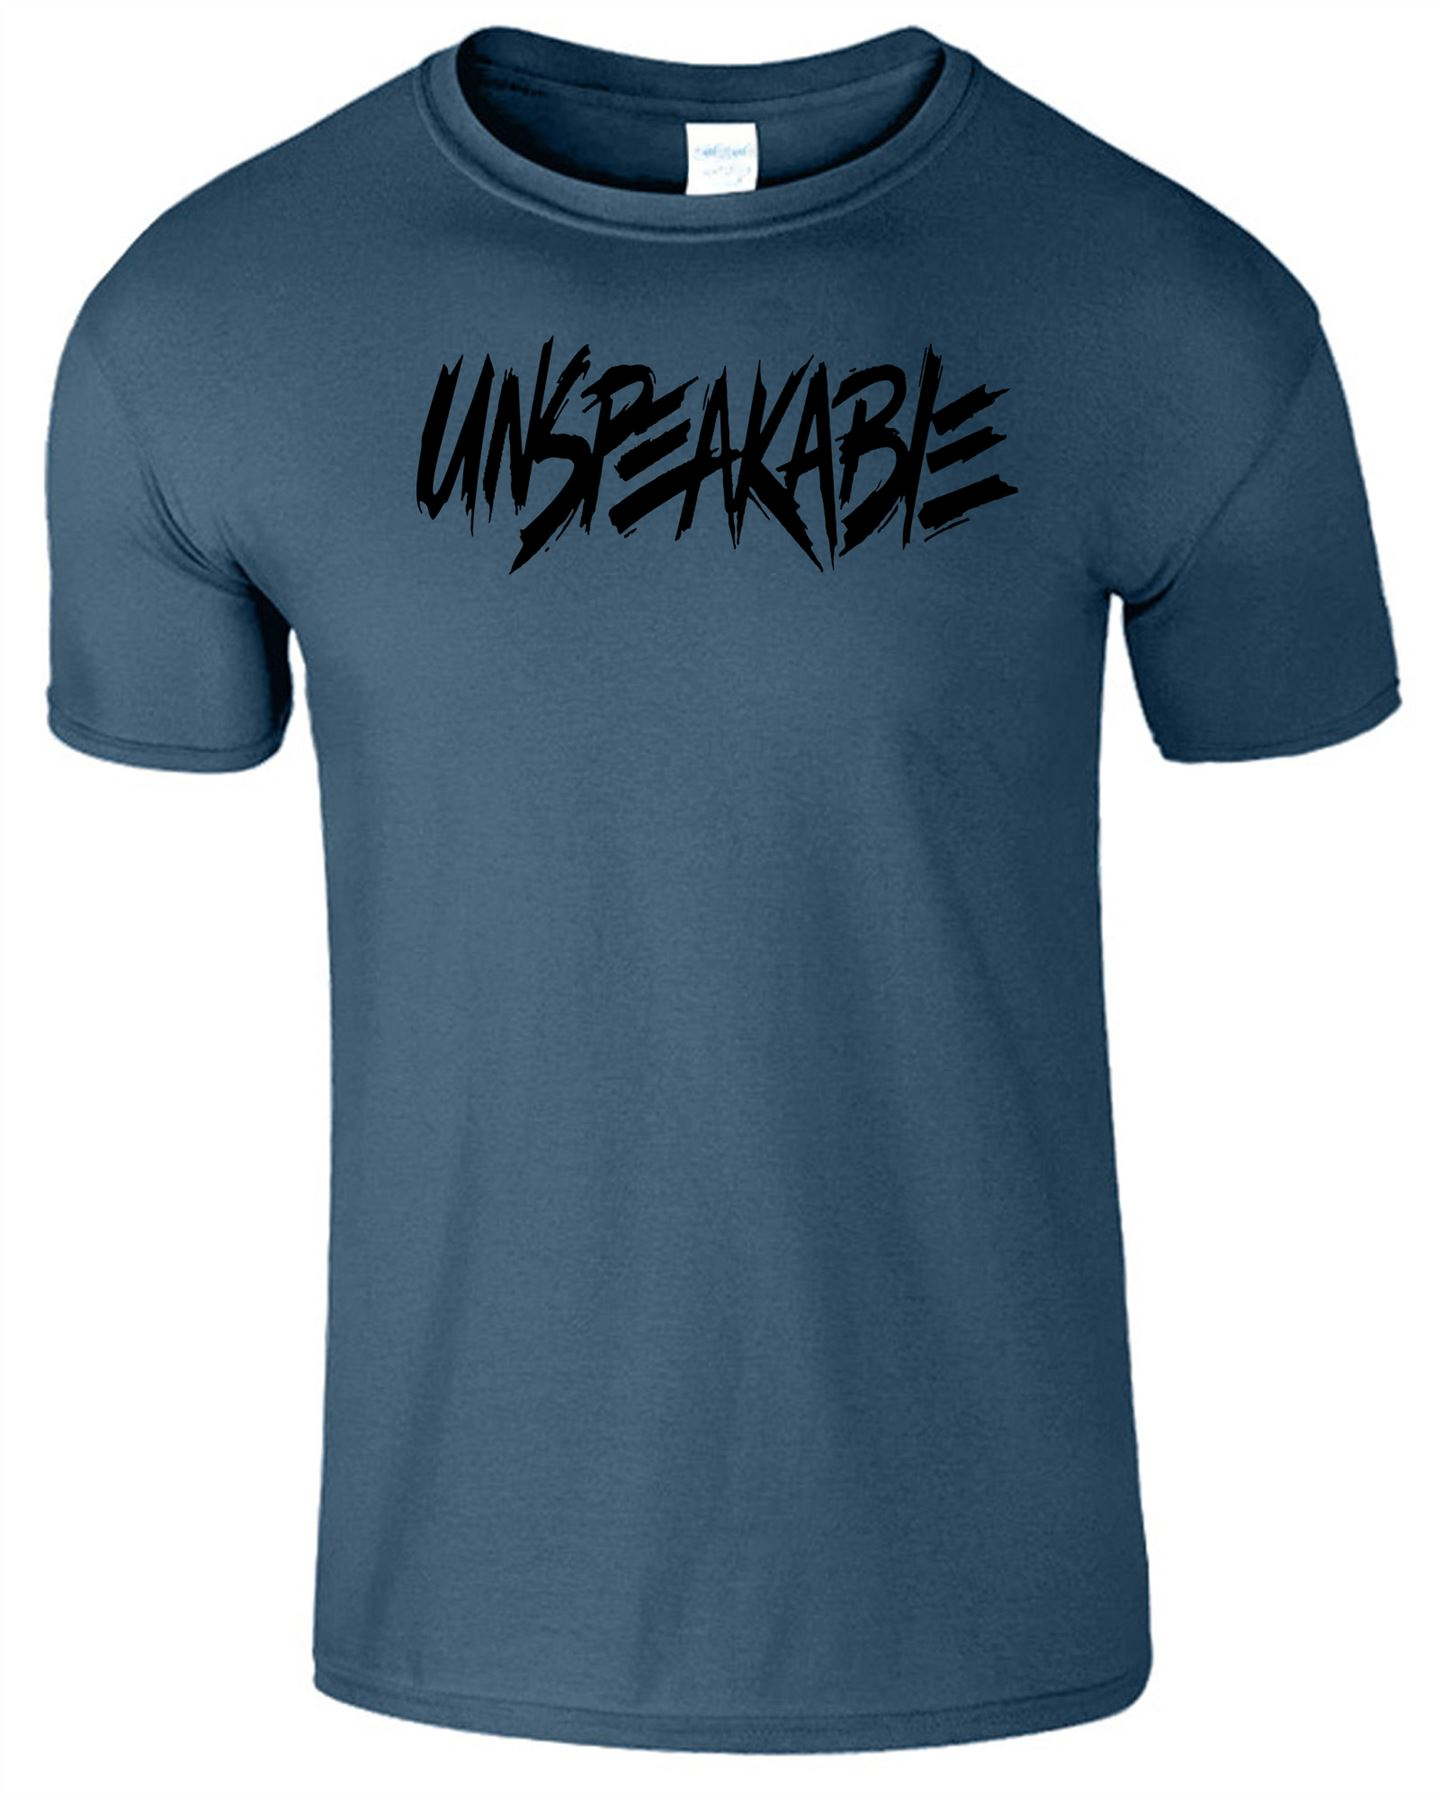 Details About Unspeakable Mens Kids T Shirt Youtube Gaming Youtuber Vlog Boys Girls T Shirt